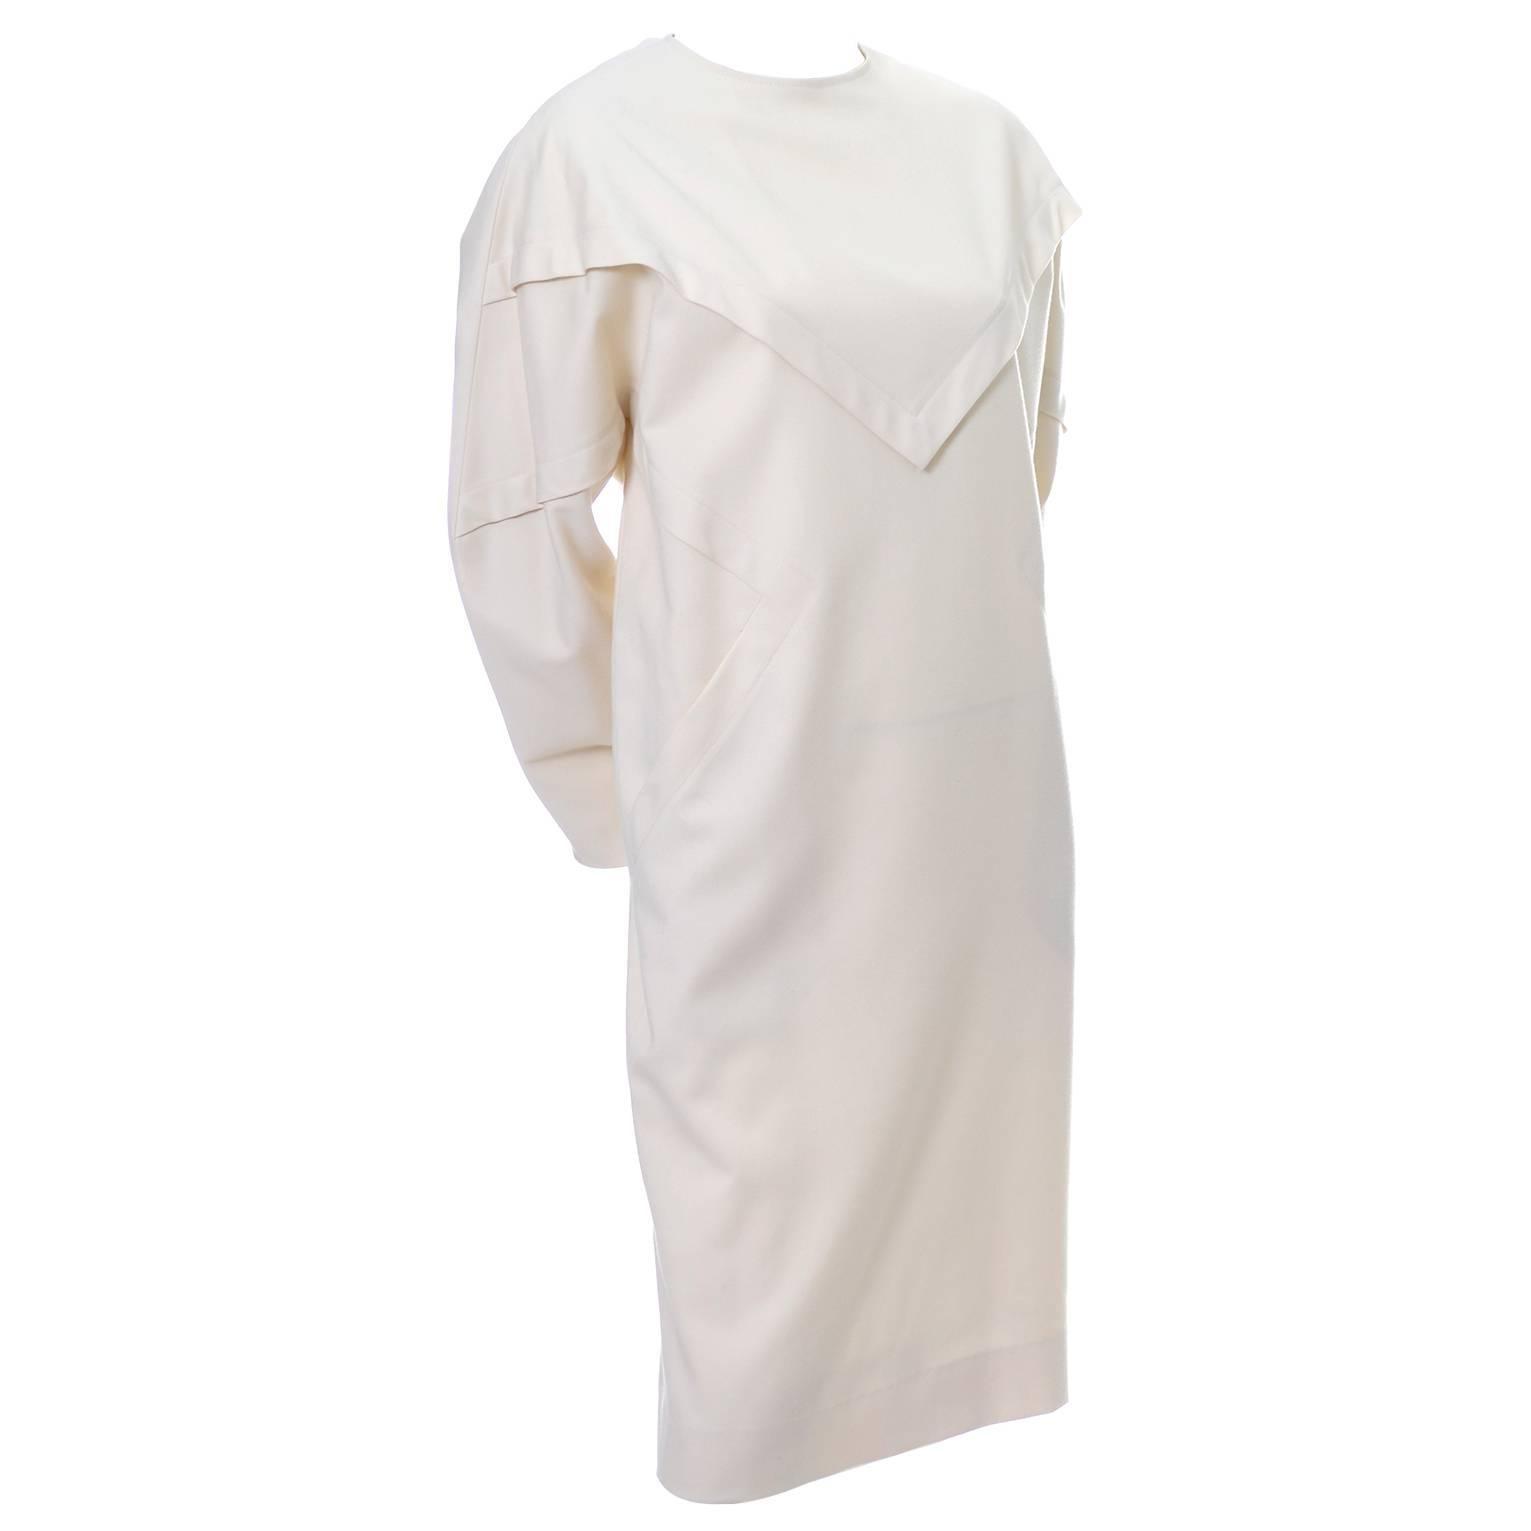 Ronaldus Shamask Avant Garde 1980's Vintage Cream Wool Dress Size 6/8